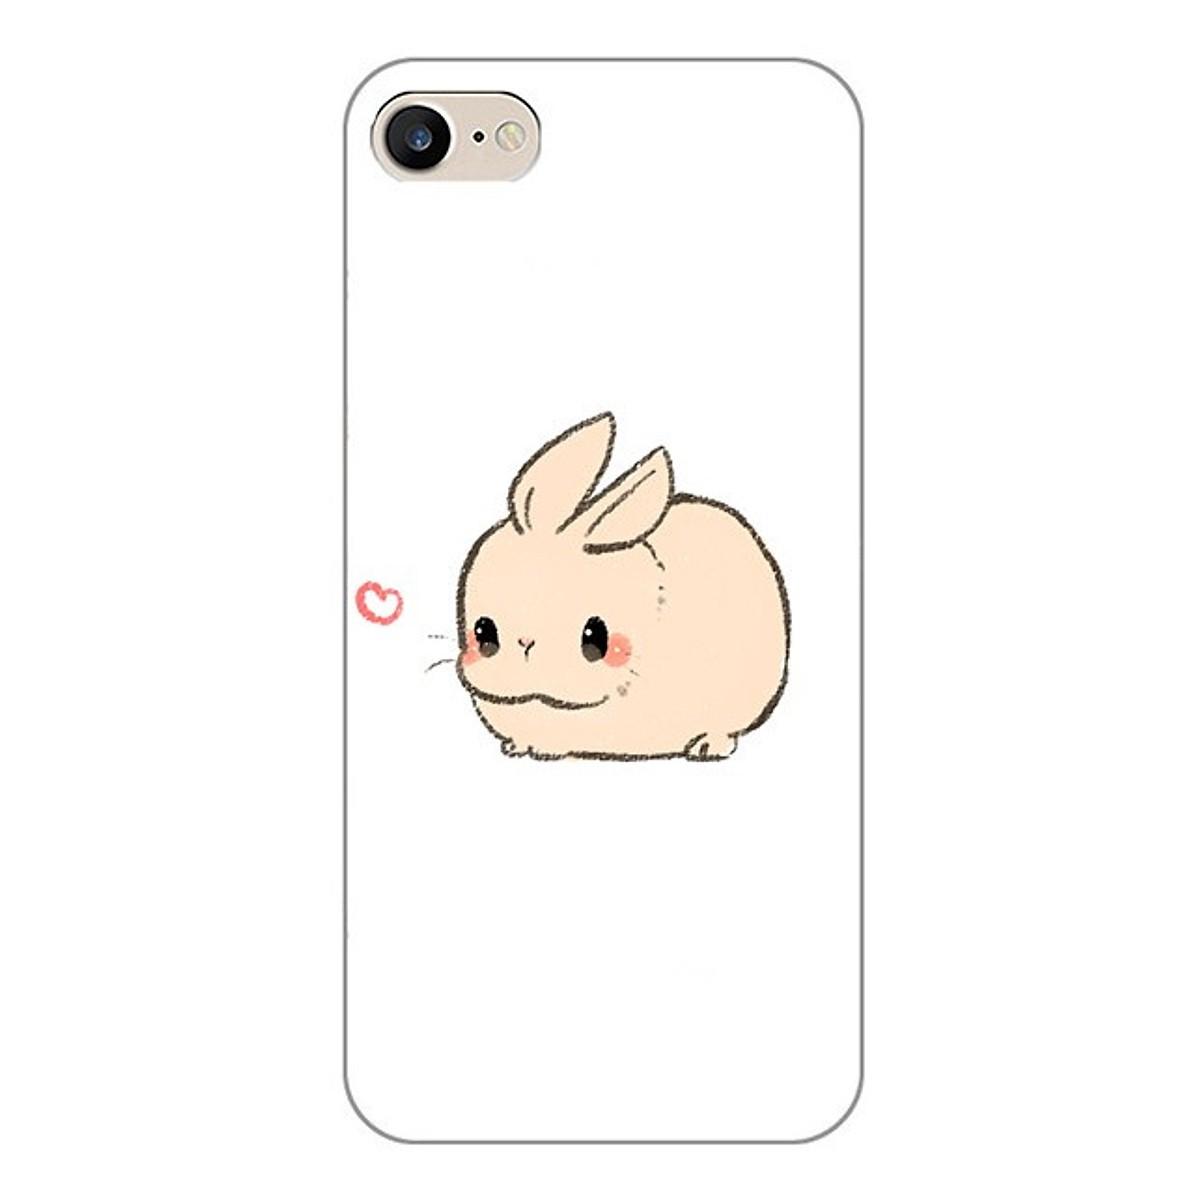 Ốp lưng Iphone 6 đẹp mẫu 6